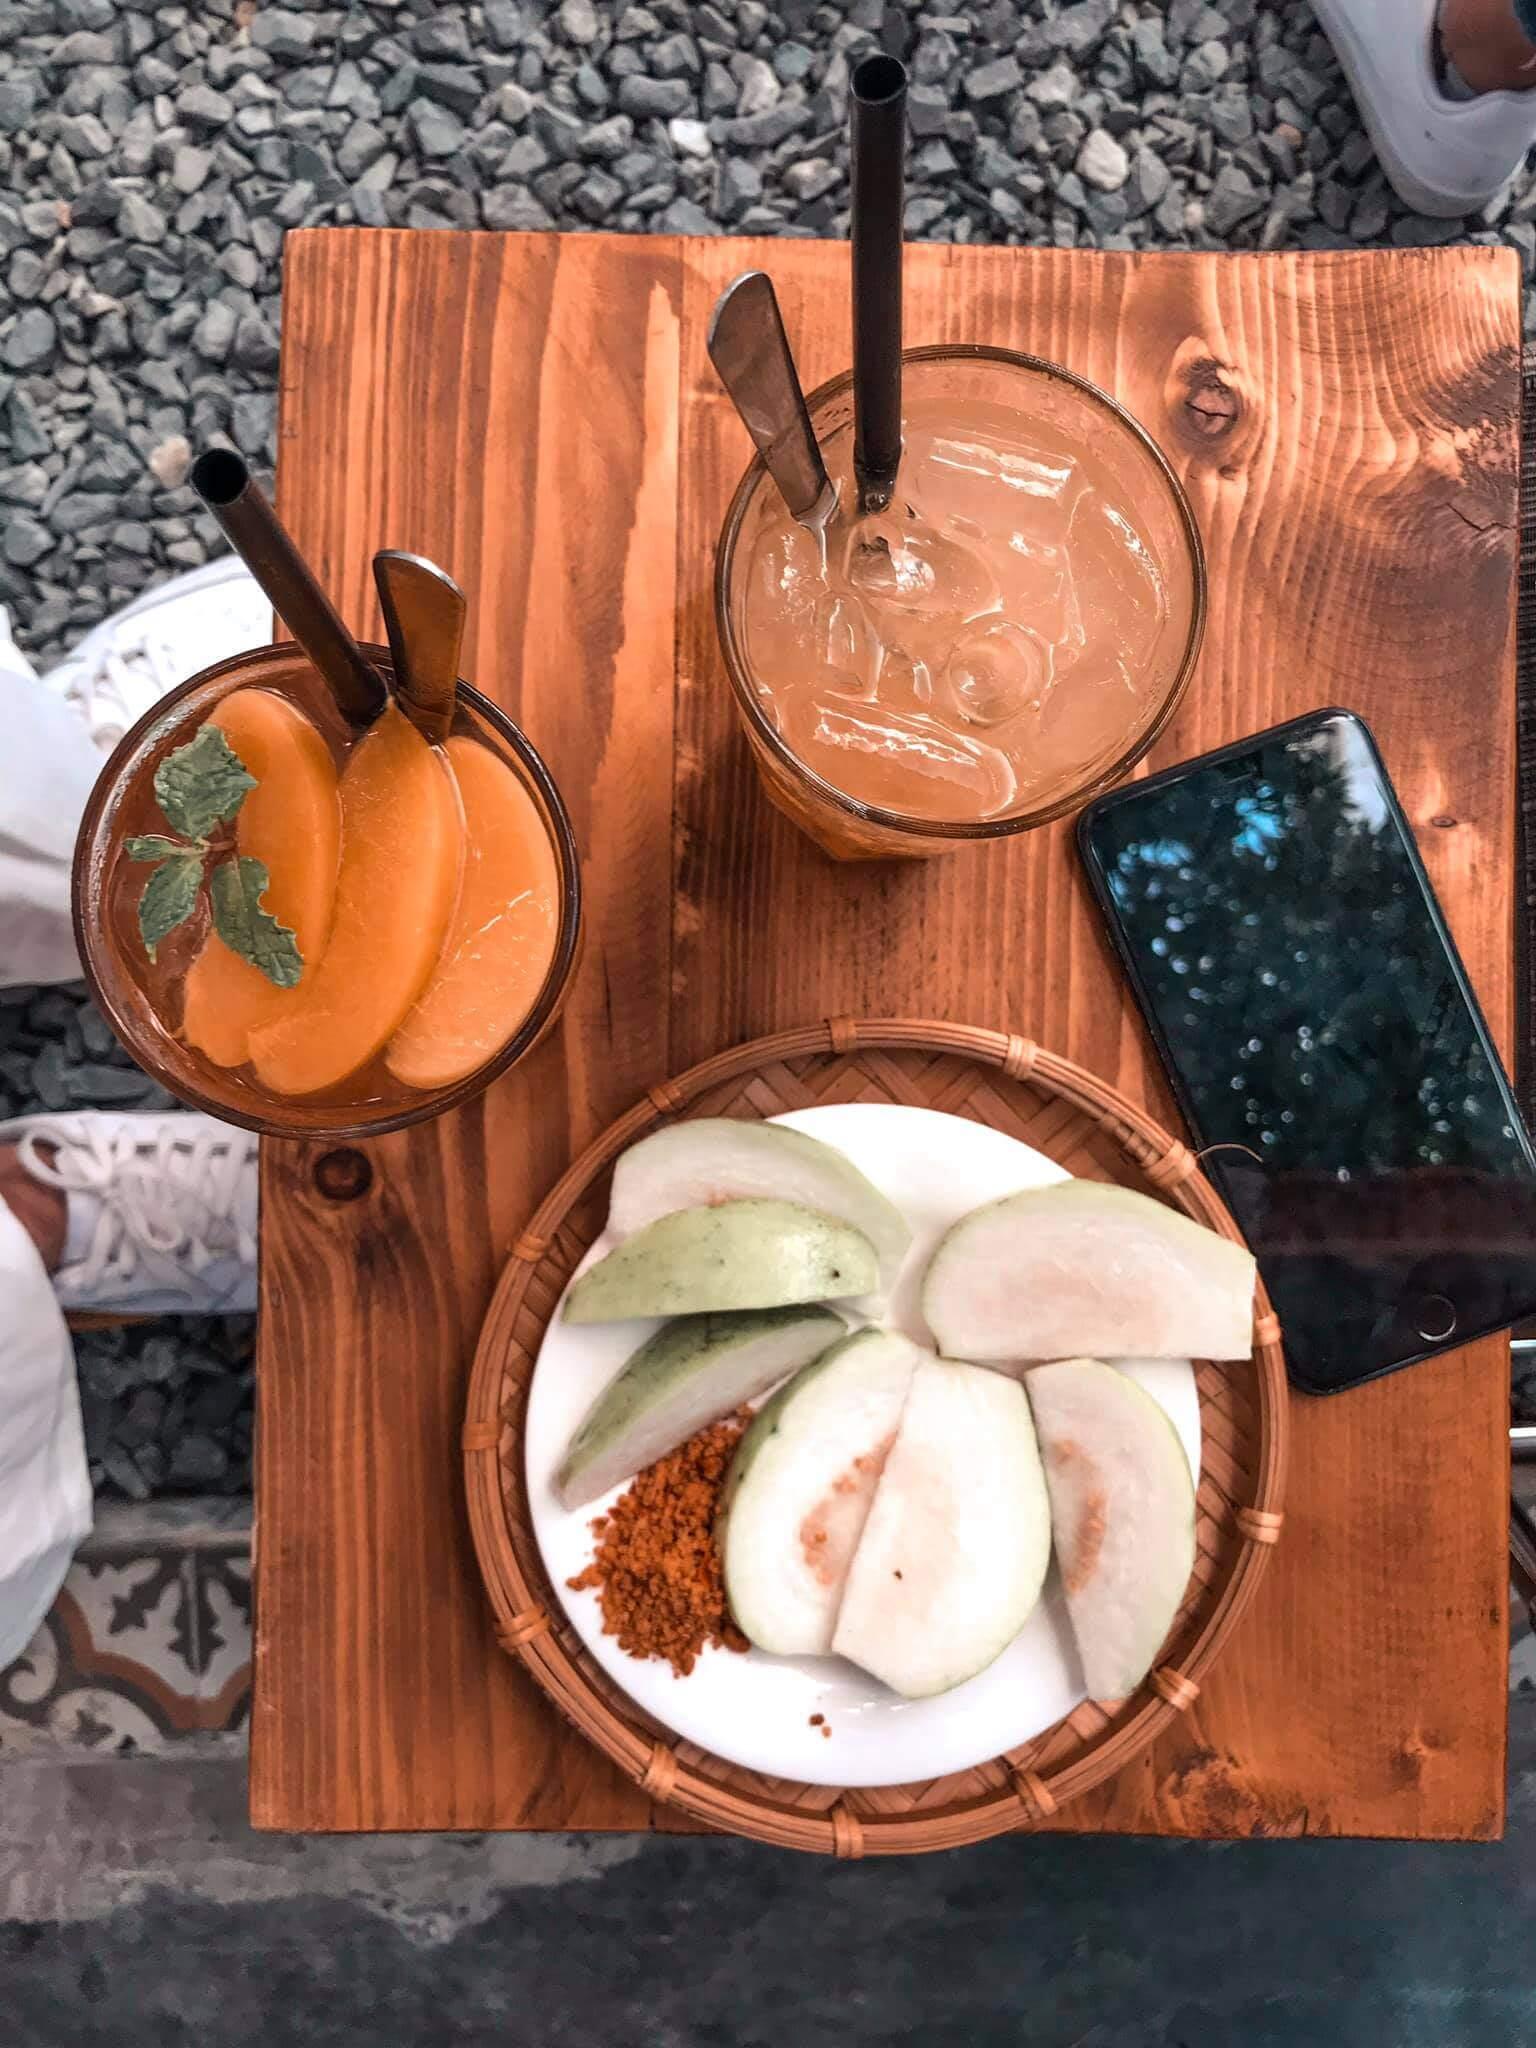 Ador Coffe Review Chuyen Du Lich Hoi An Da Nang Chanh Sa 3n2d 01